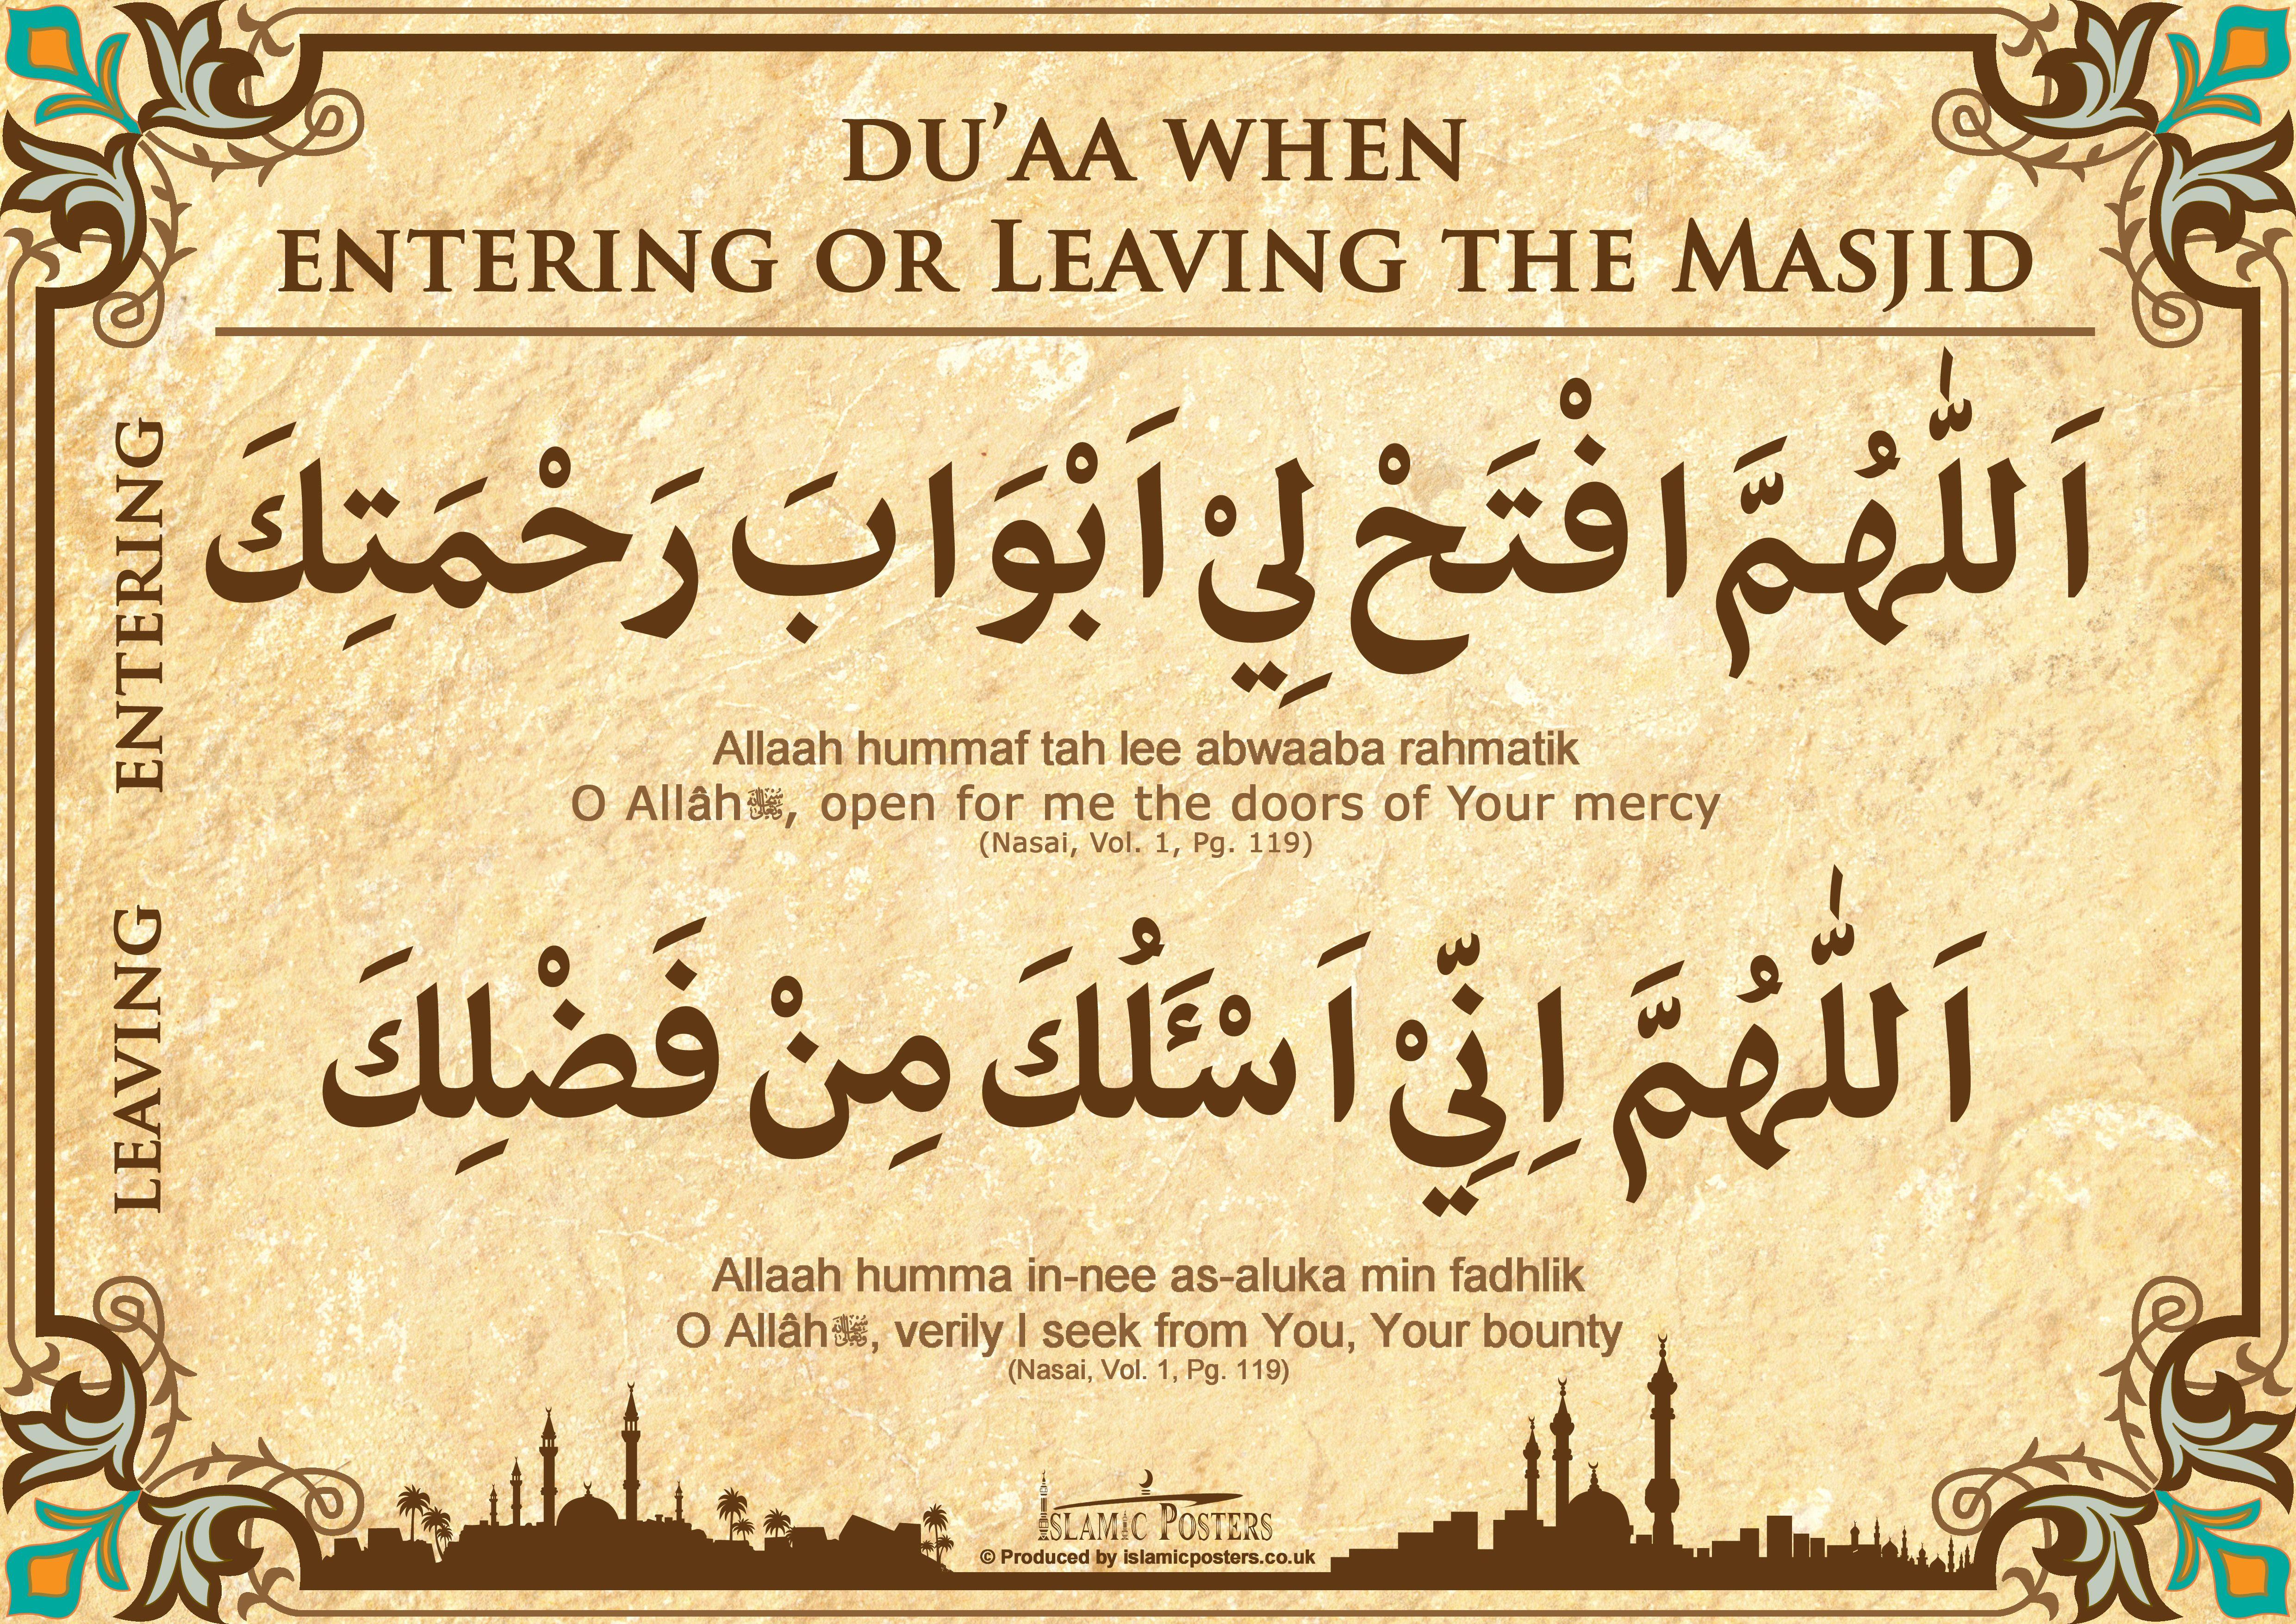 Duaa When Entering And When Leaving The Masjid Duaa Dua